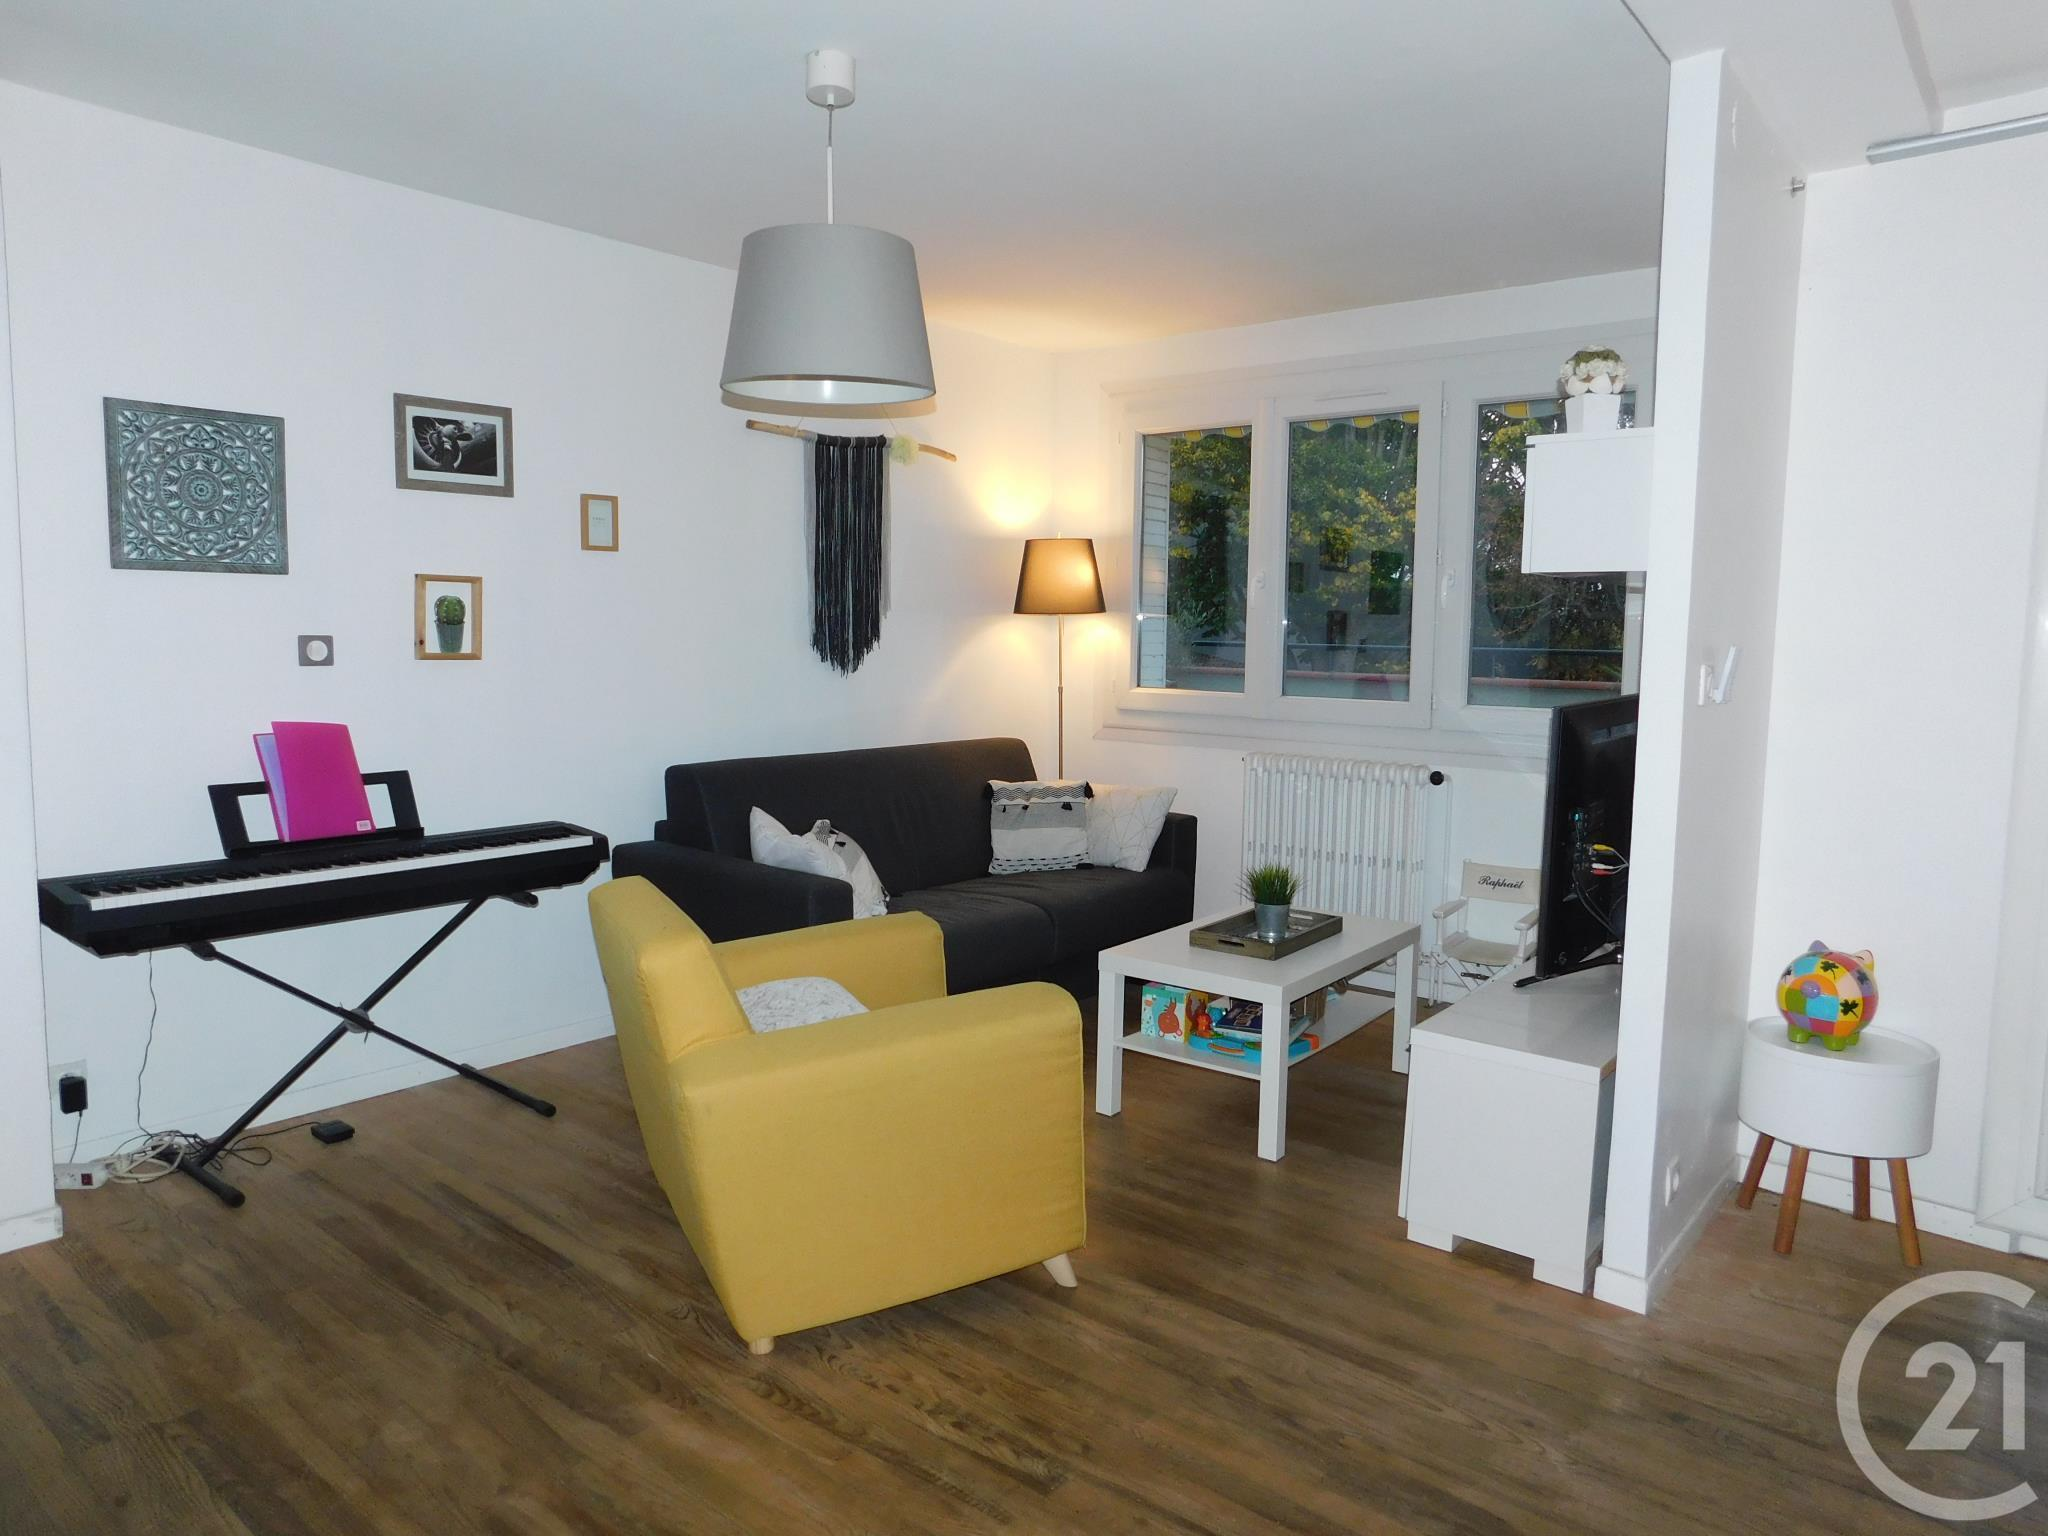 appartement f3 vendre 4 pi ces 70 m2 blagnac 31 midi pyrenees. Black Bedroom Furniture Sets. Home Design Ideas